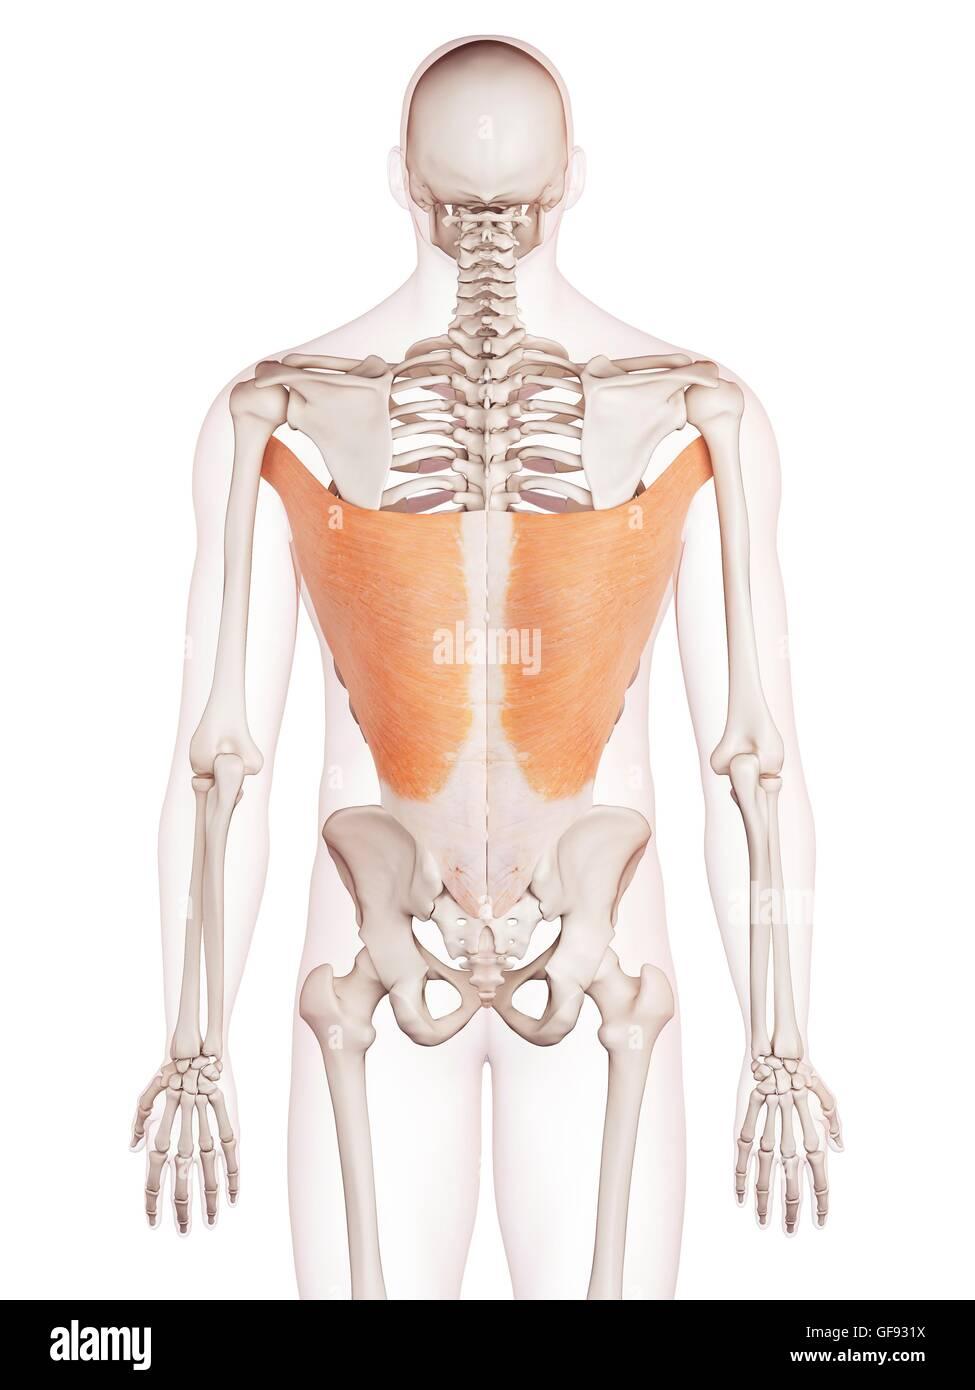 Muscles Bones Back Stockfotos & Muscles Bones Back Bilder - Alamy